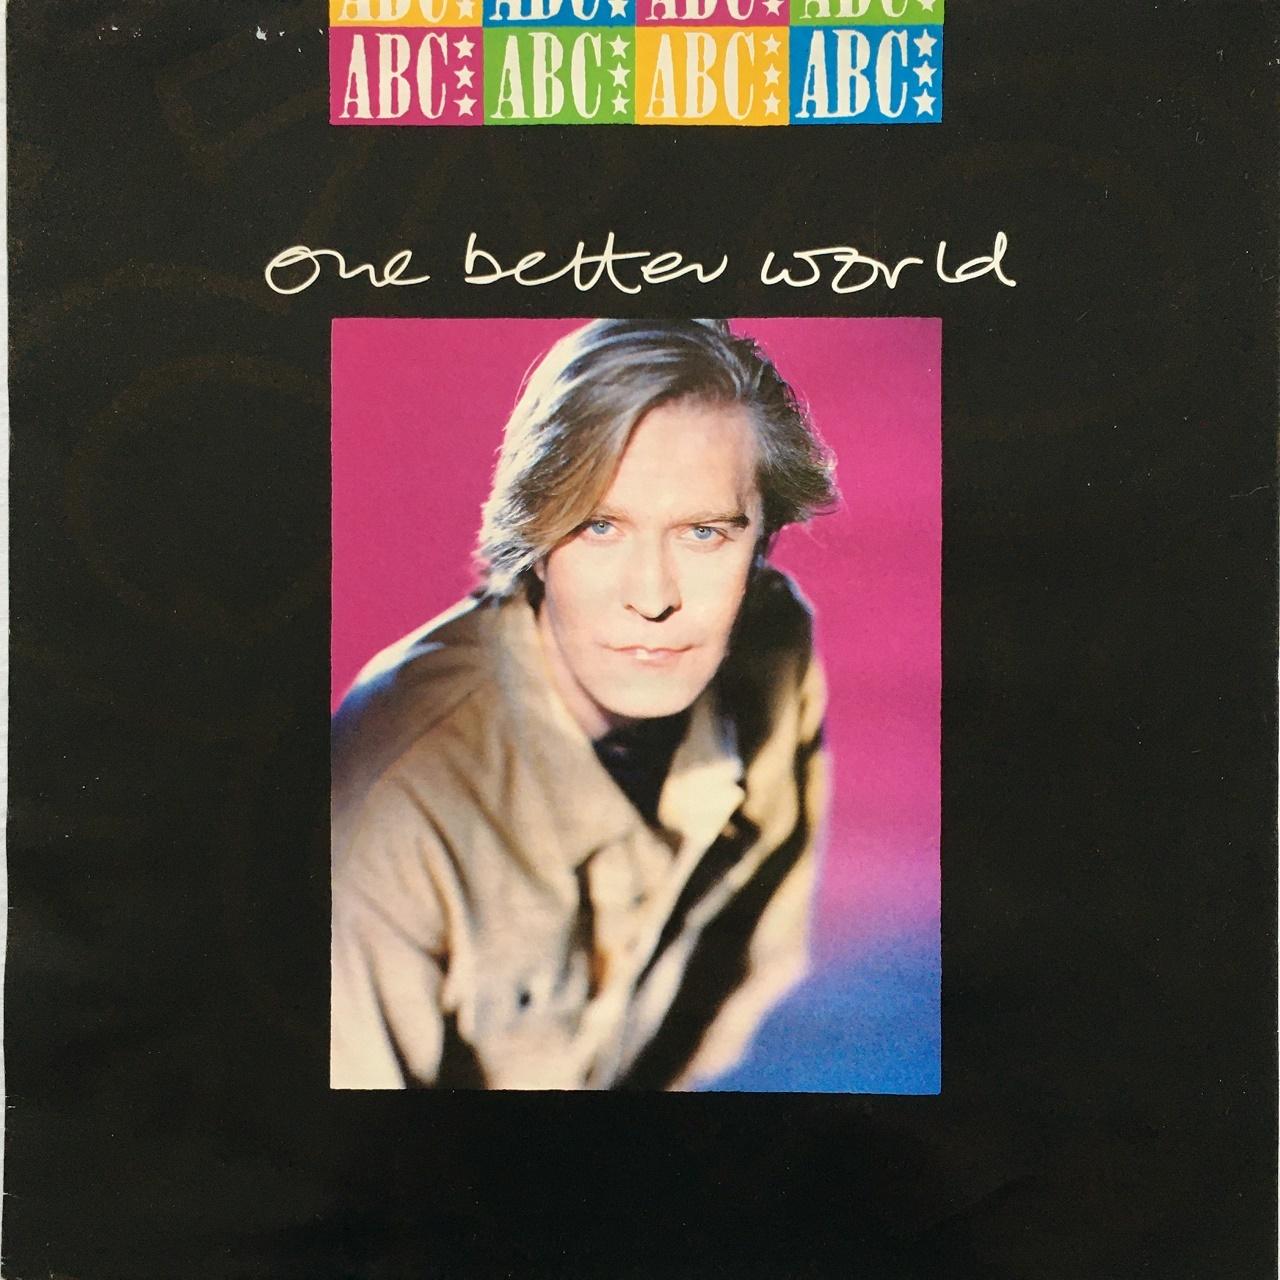 【12inch・英盤】ABC / One Better World